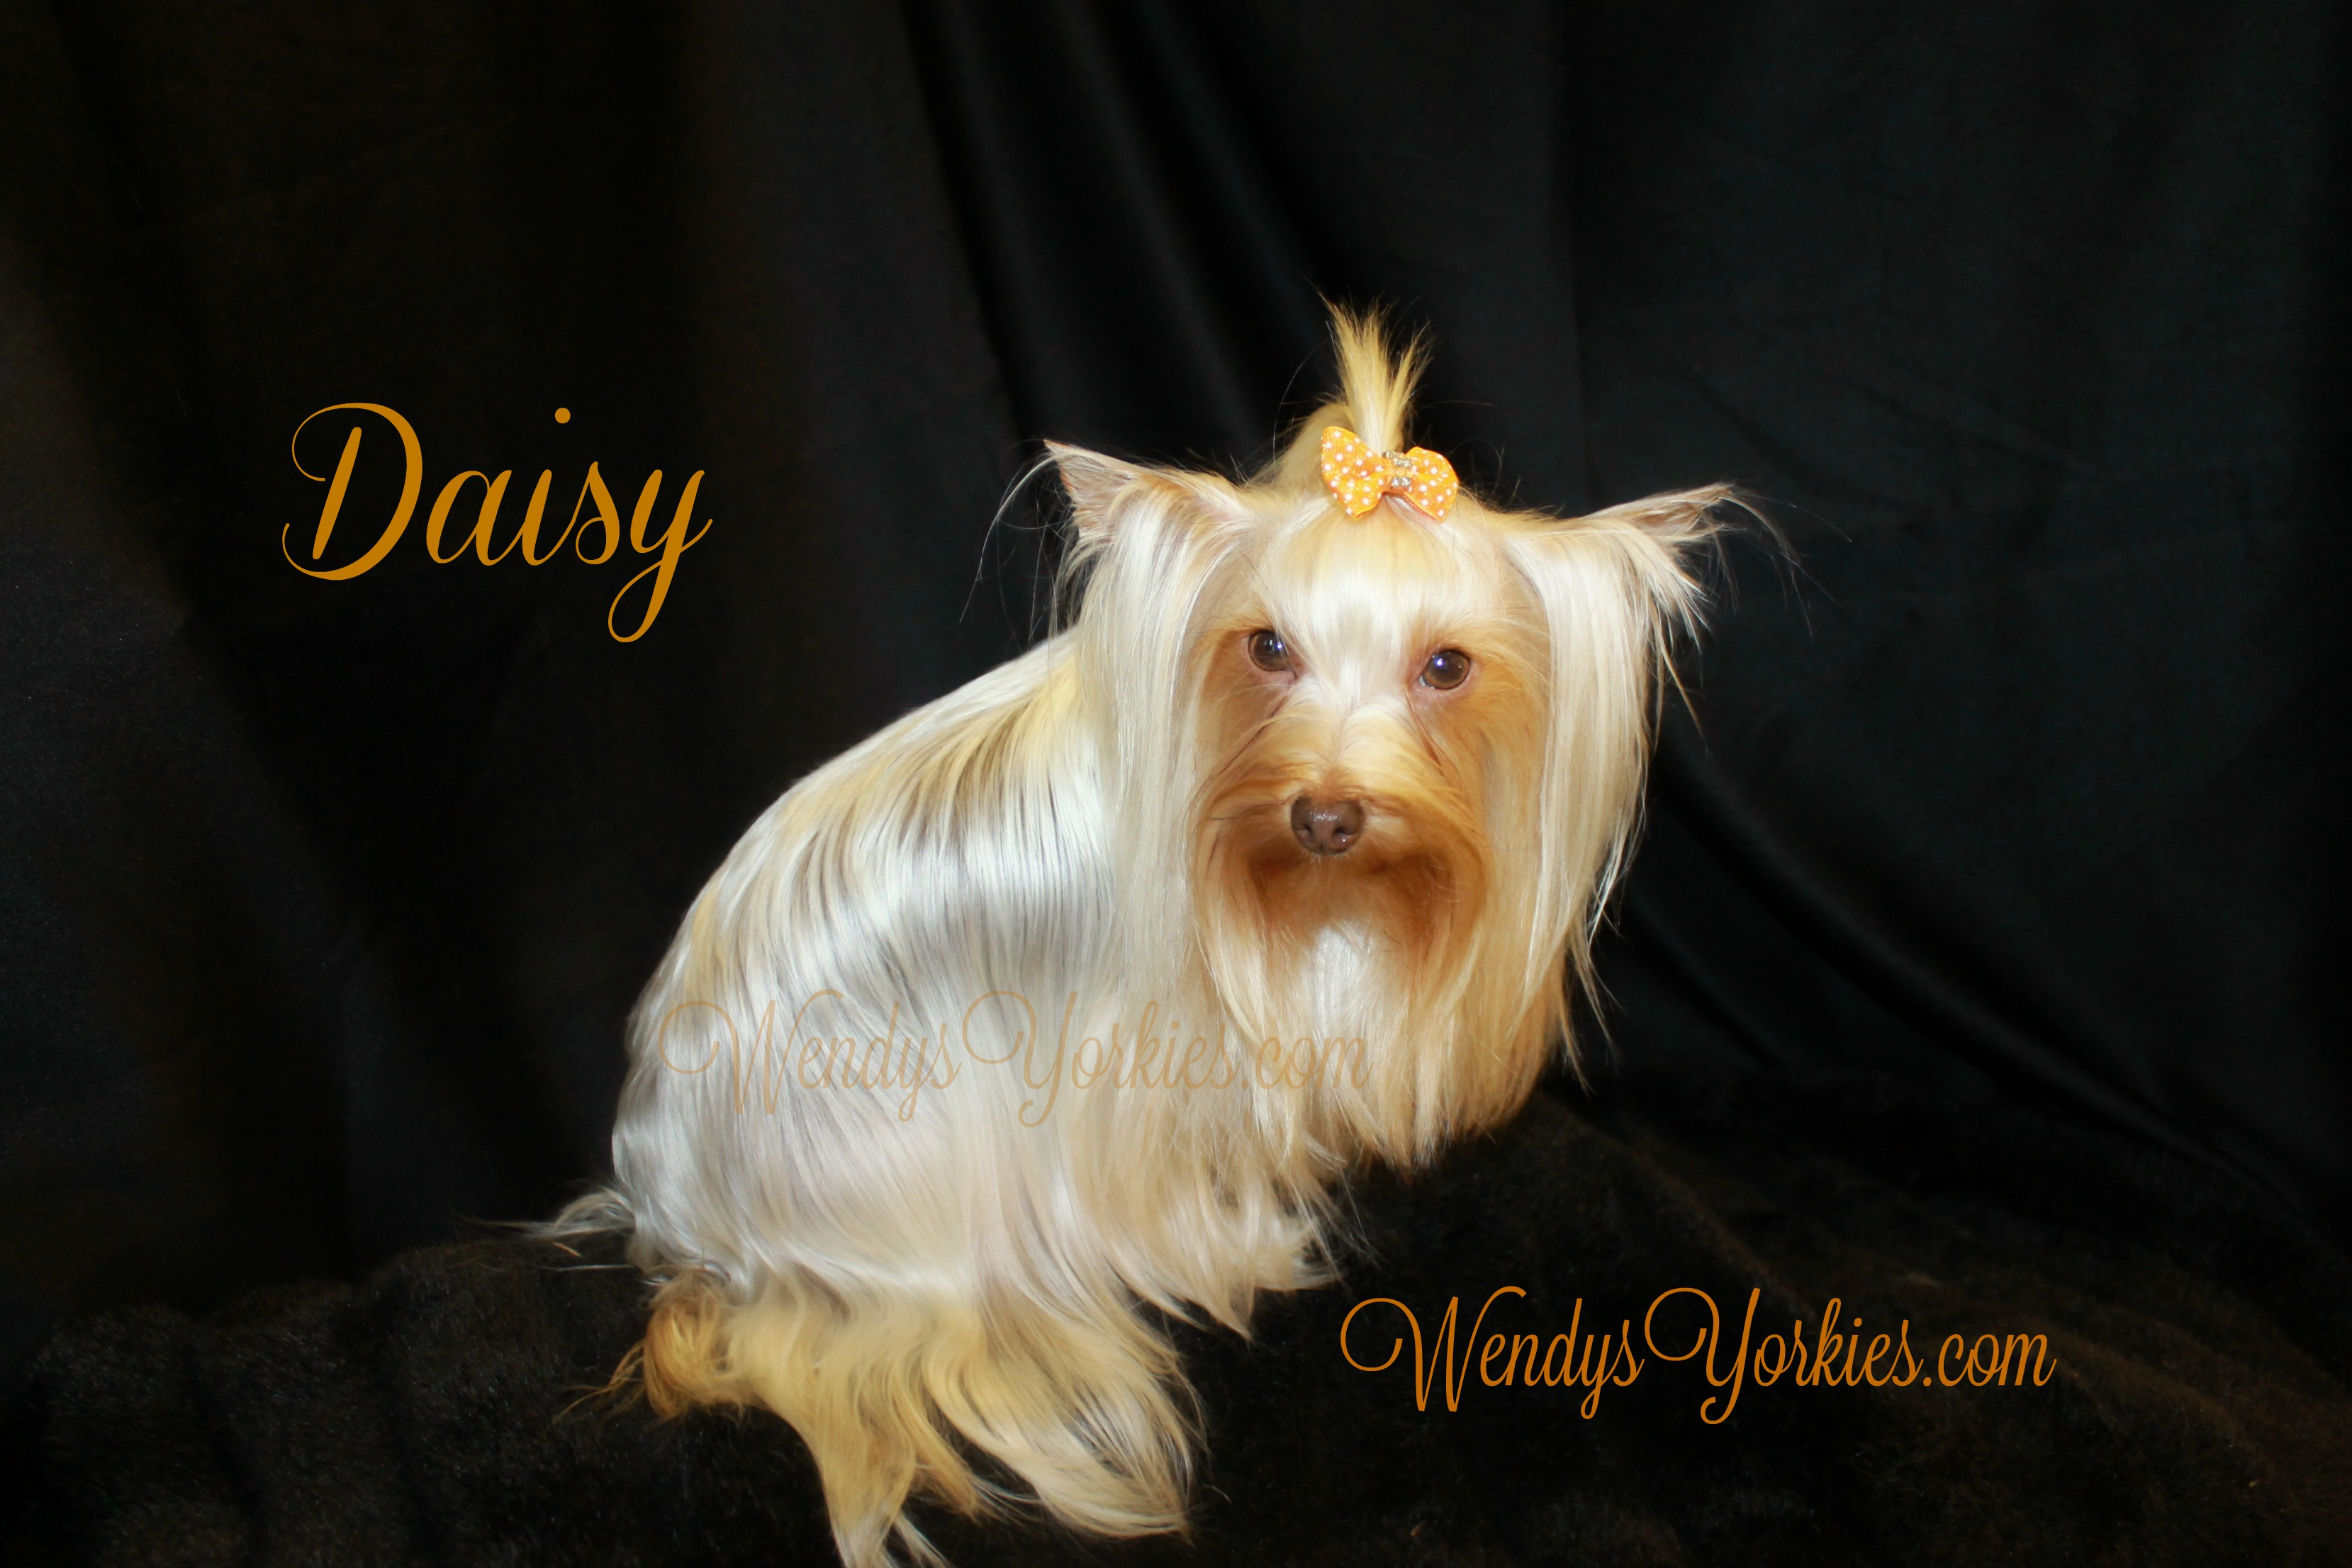 Yorkie puppy breeder in Texas, WendysYorkies.com, Daisy